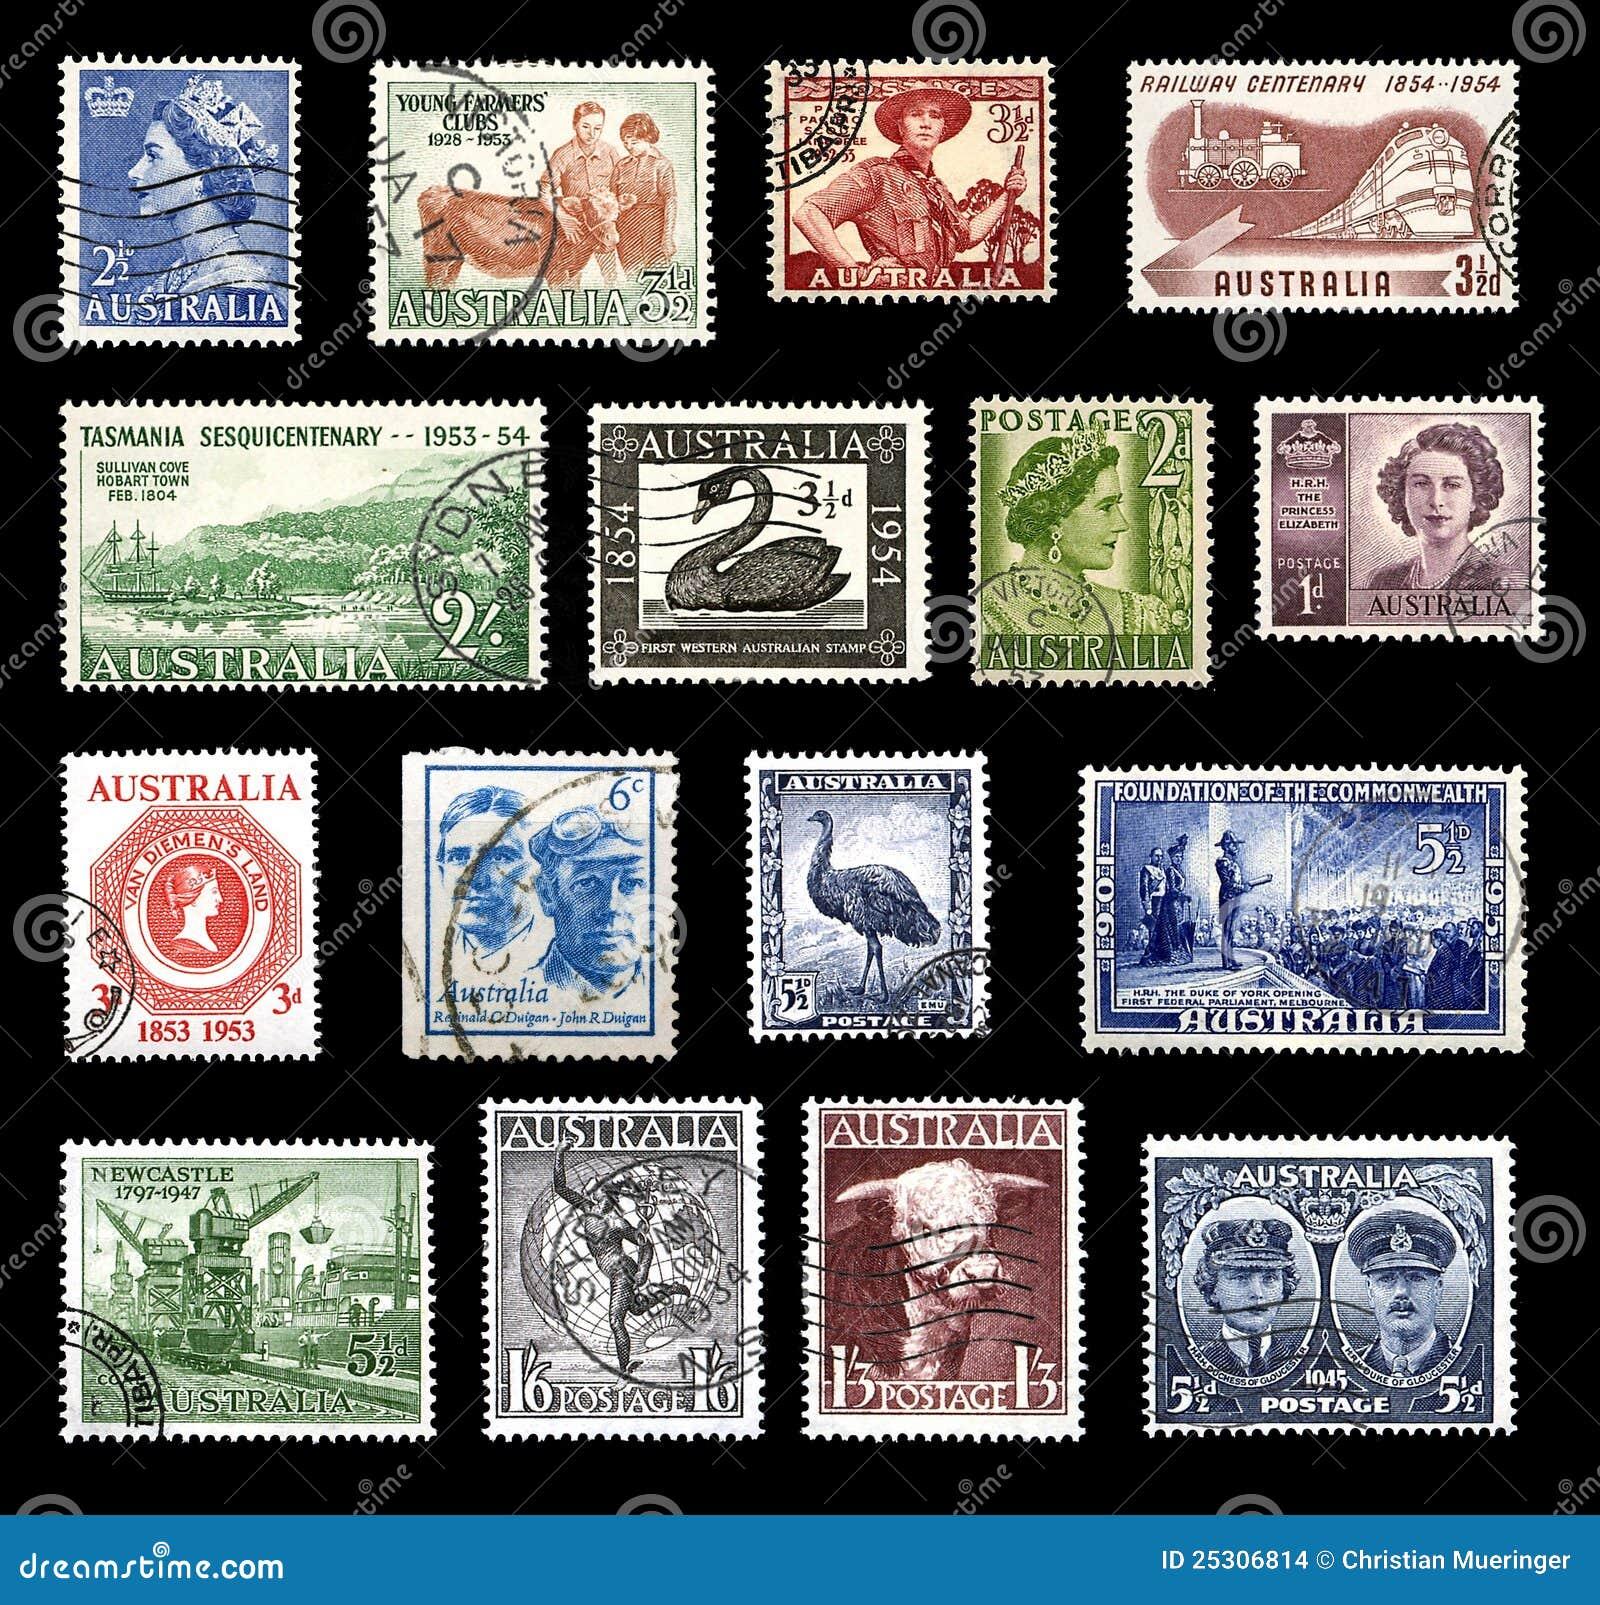 stamp collectors sydney australia time - photo#1